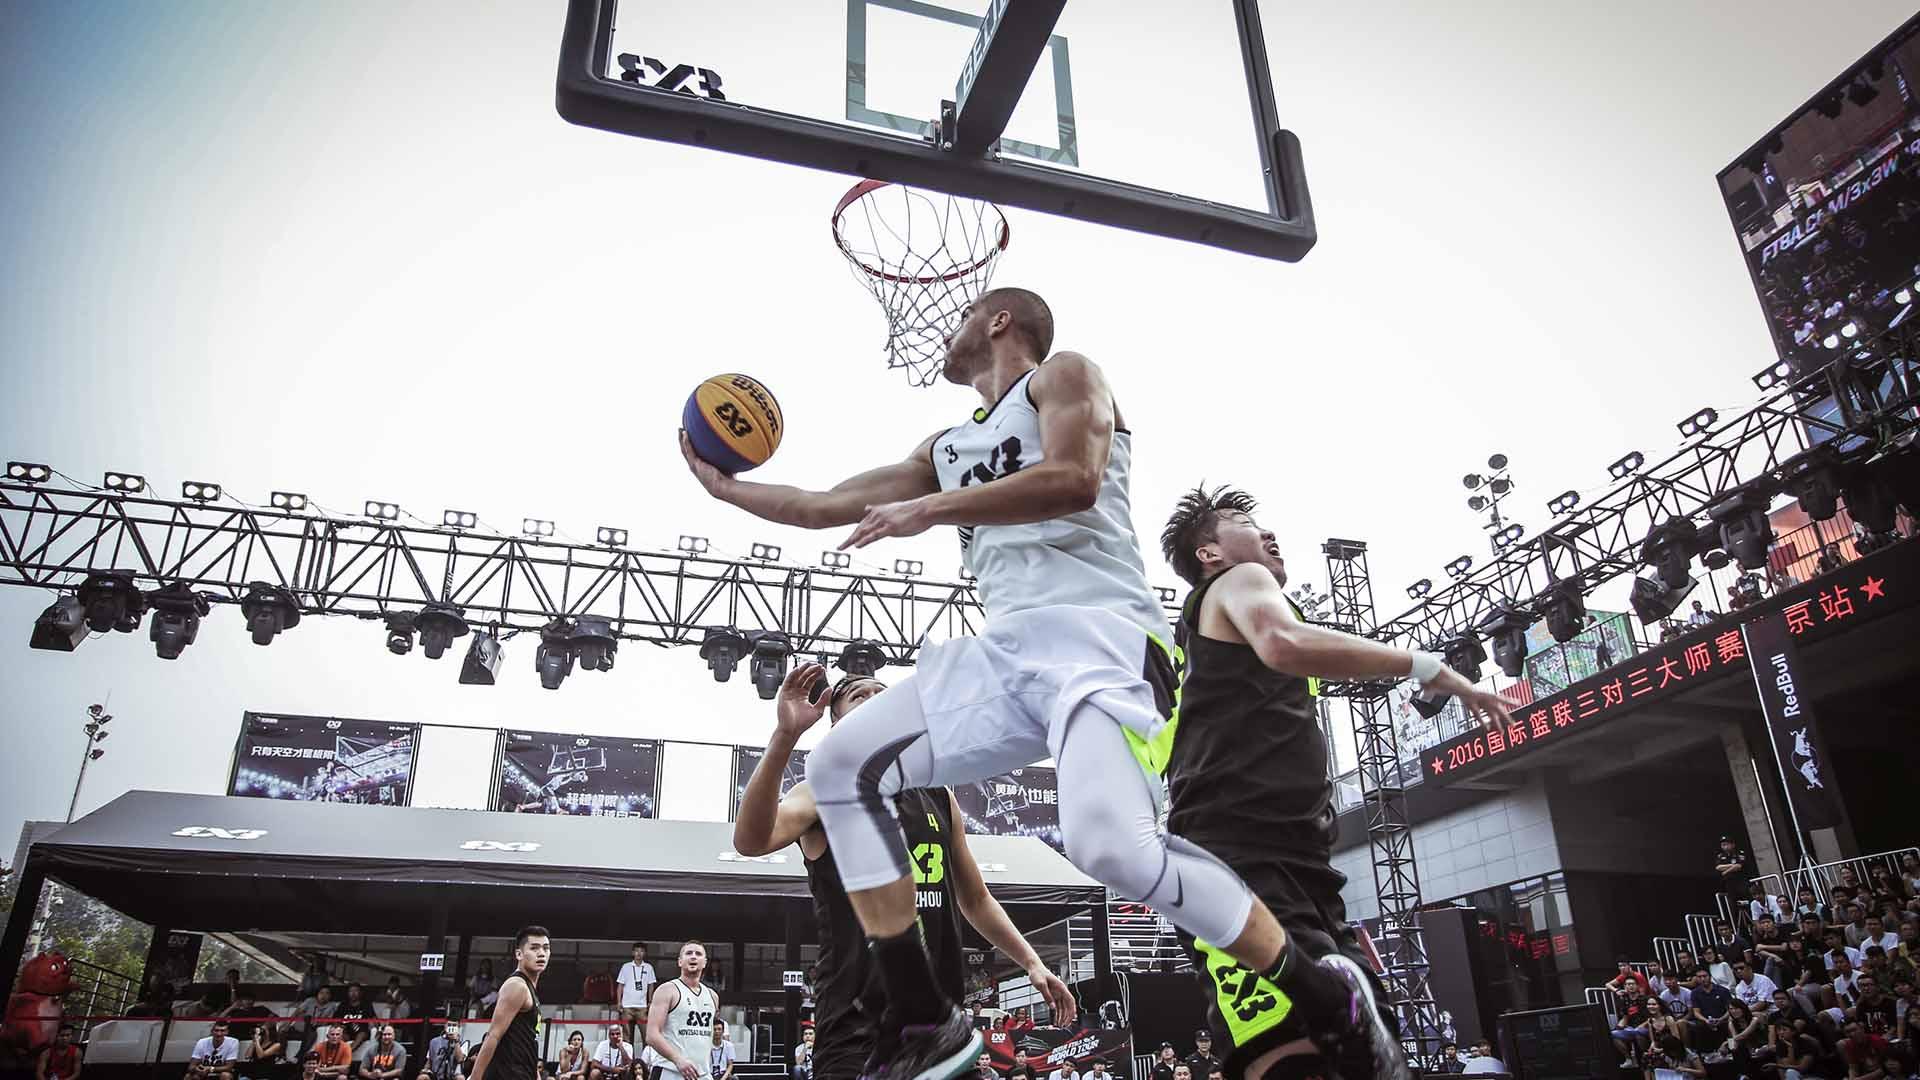 história basquete 3x3